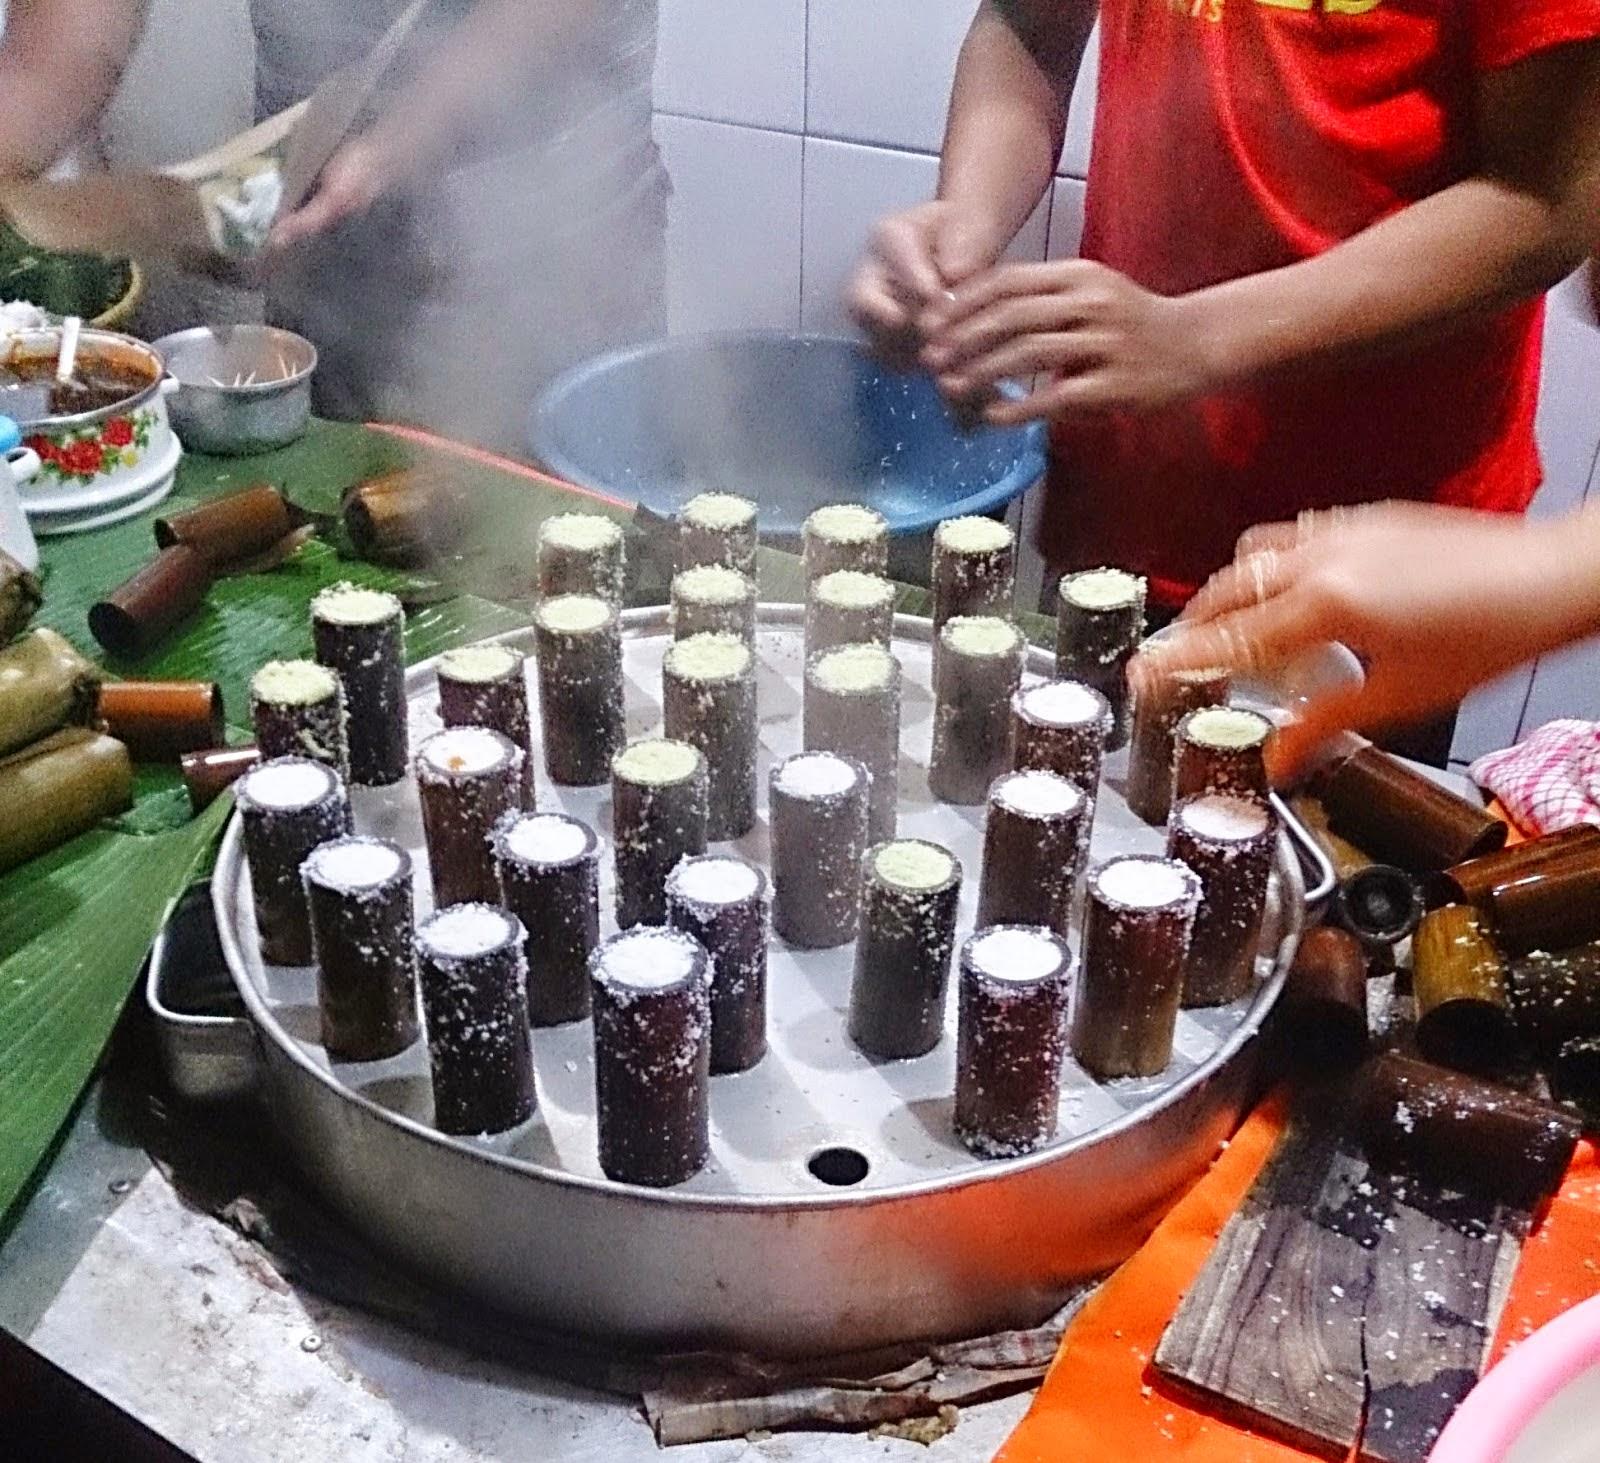 Puthu Lanang, Puthu Lanang Malang, Kota Malang, Dolan Dolen, Dolaners Puthu Lanang via Qumil Laila - Dolan Dolen